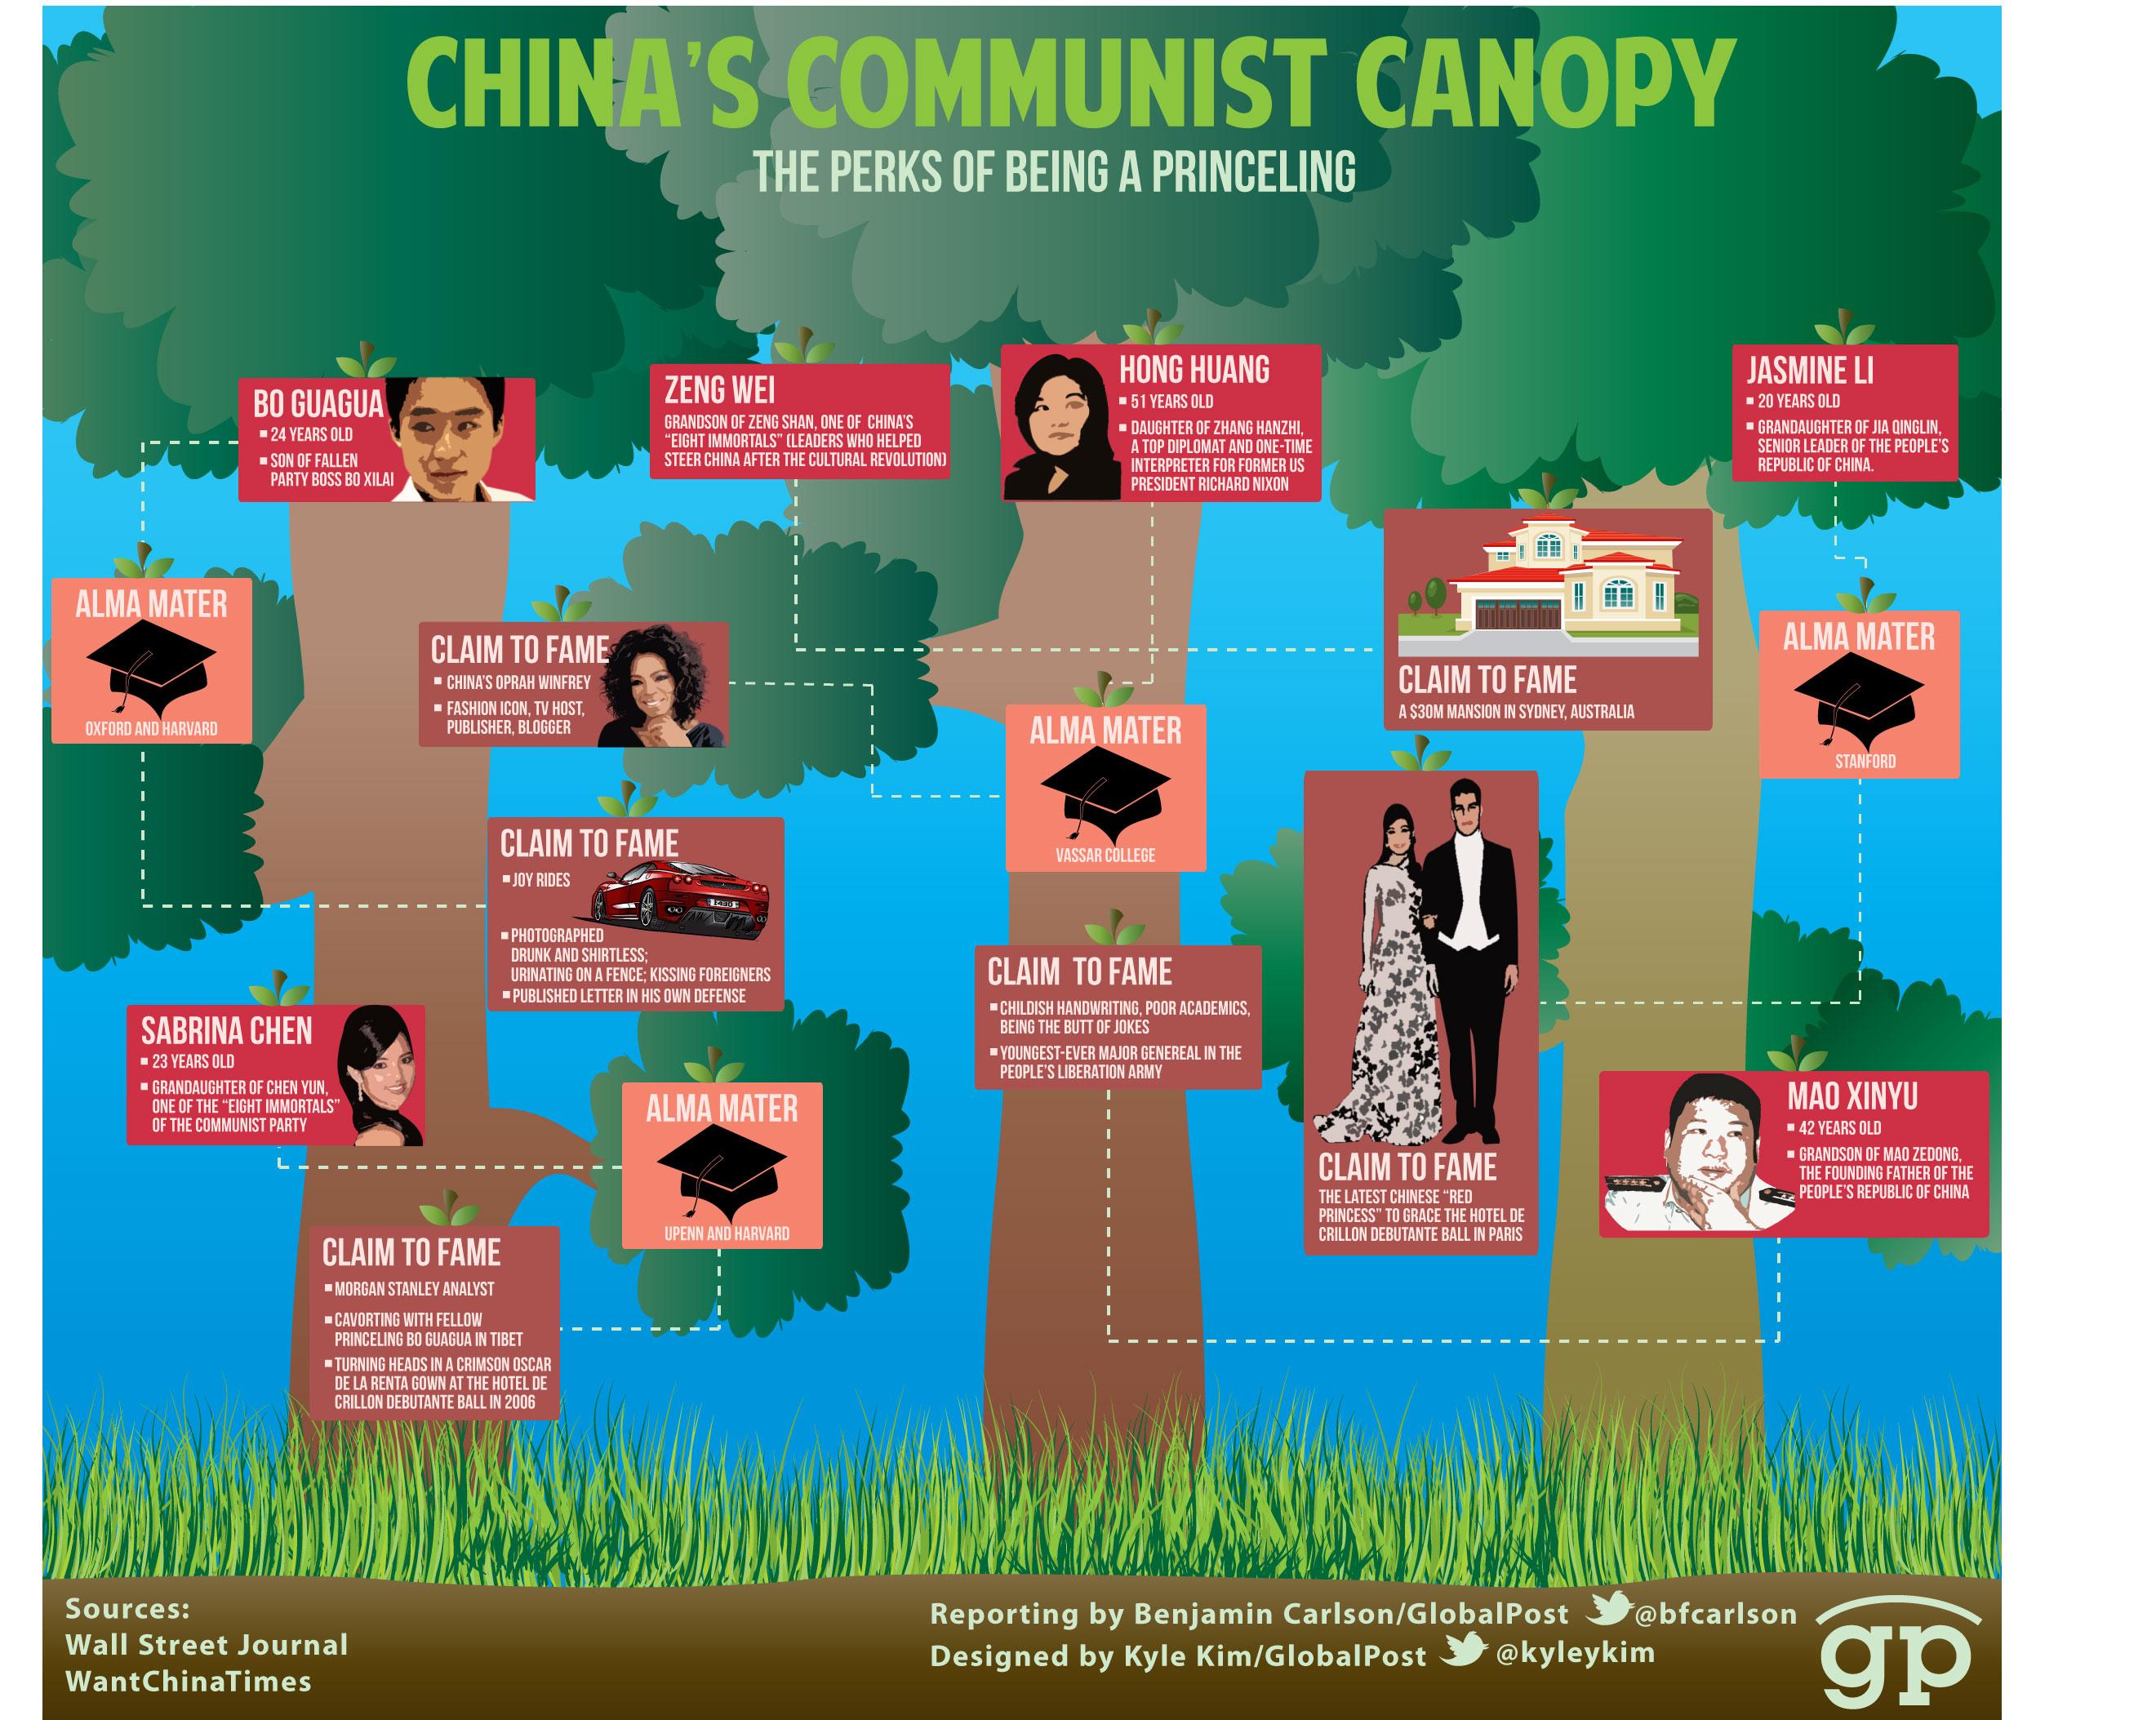 ChinasRedRoyaltyalookattherichandprivile